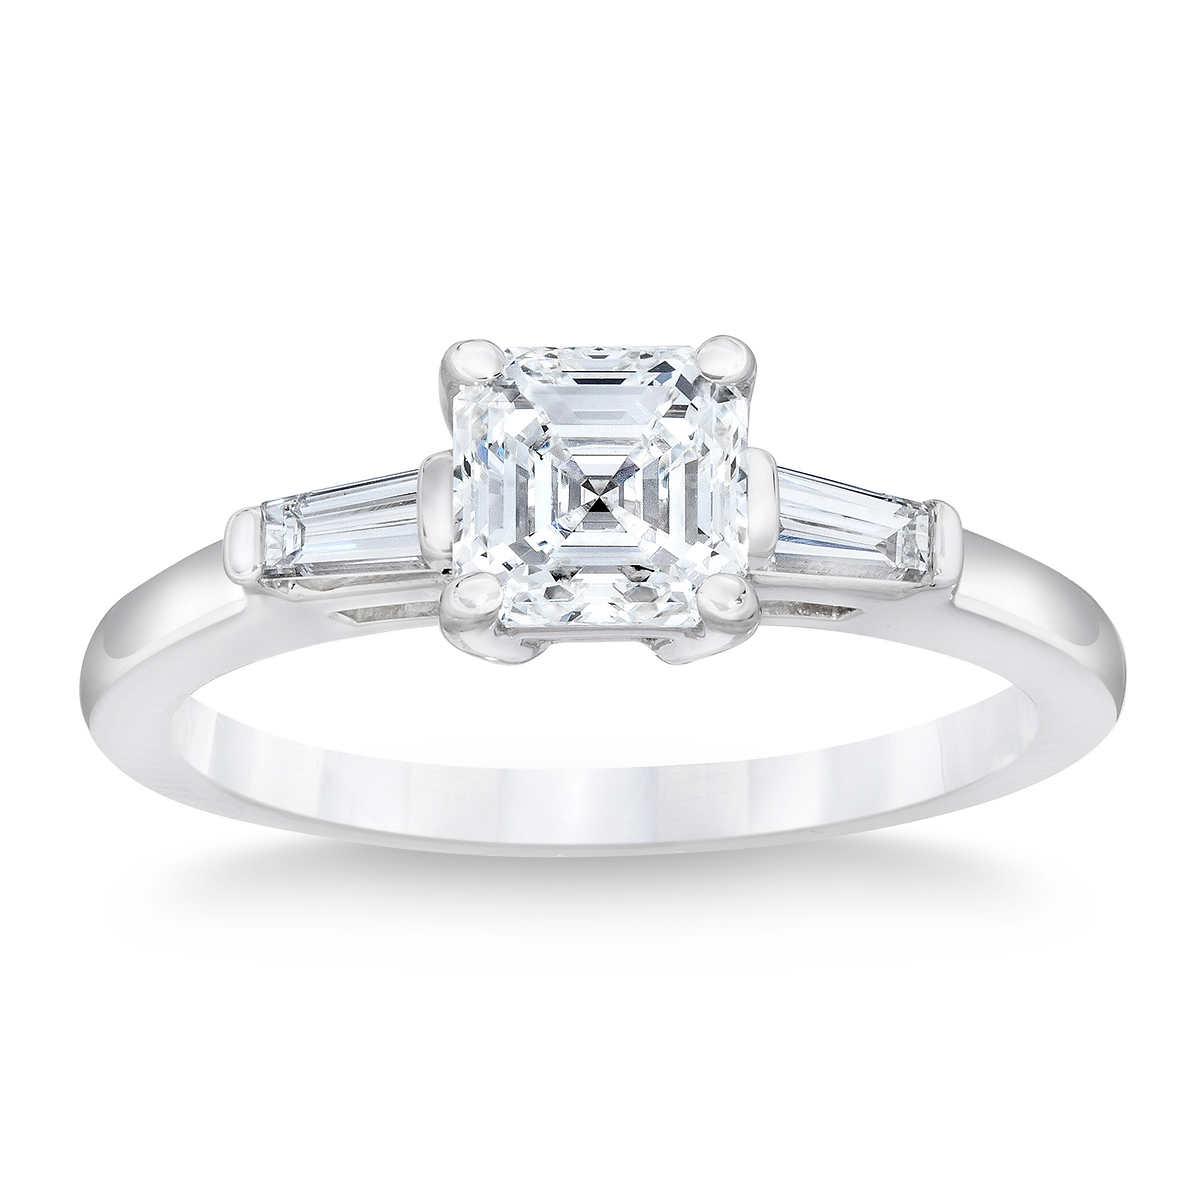 engagement wedding ring Square Emerald Cut 2 69 ctw VS2 Clarity E Color Diamond Baguette Platinum Ring